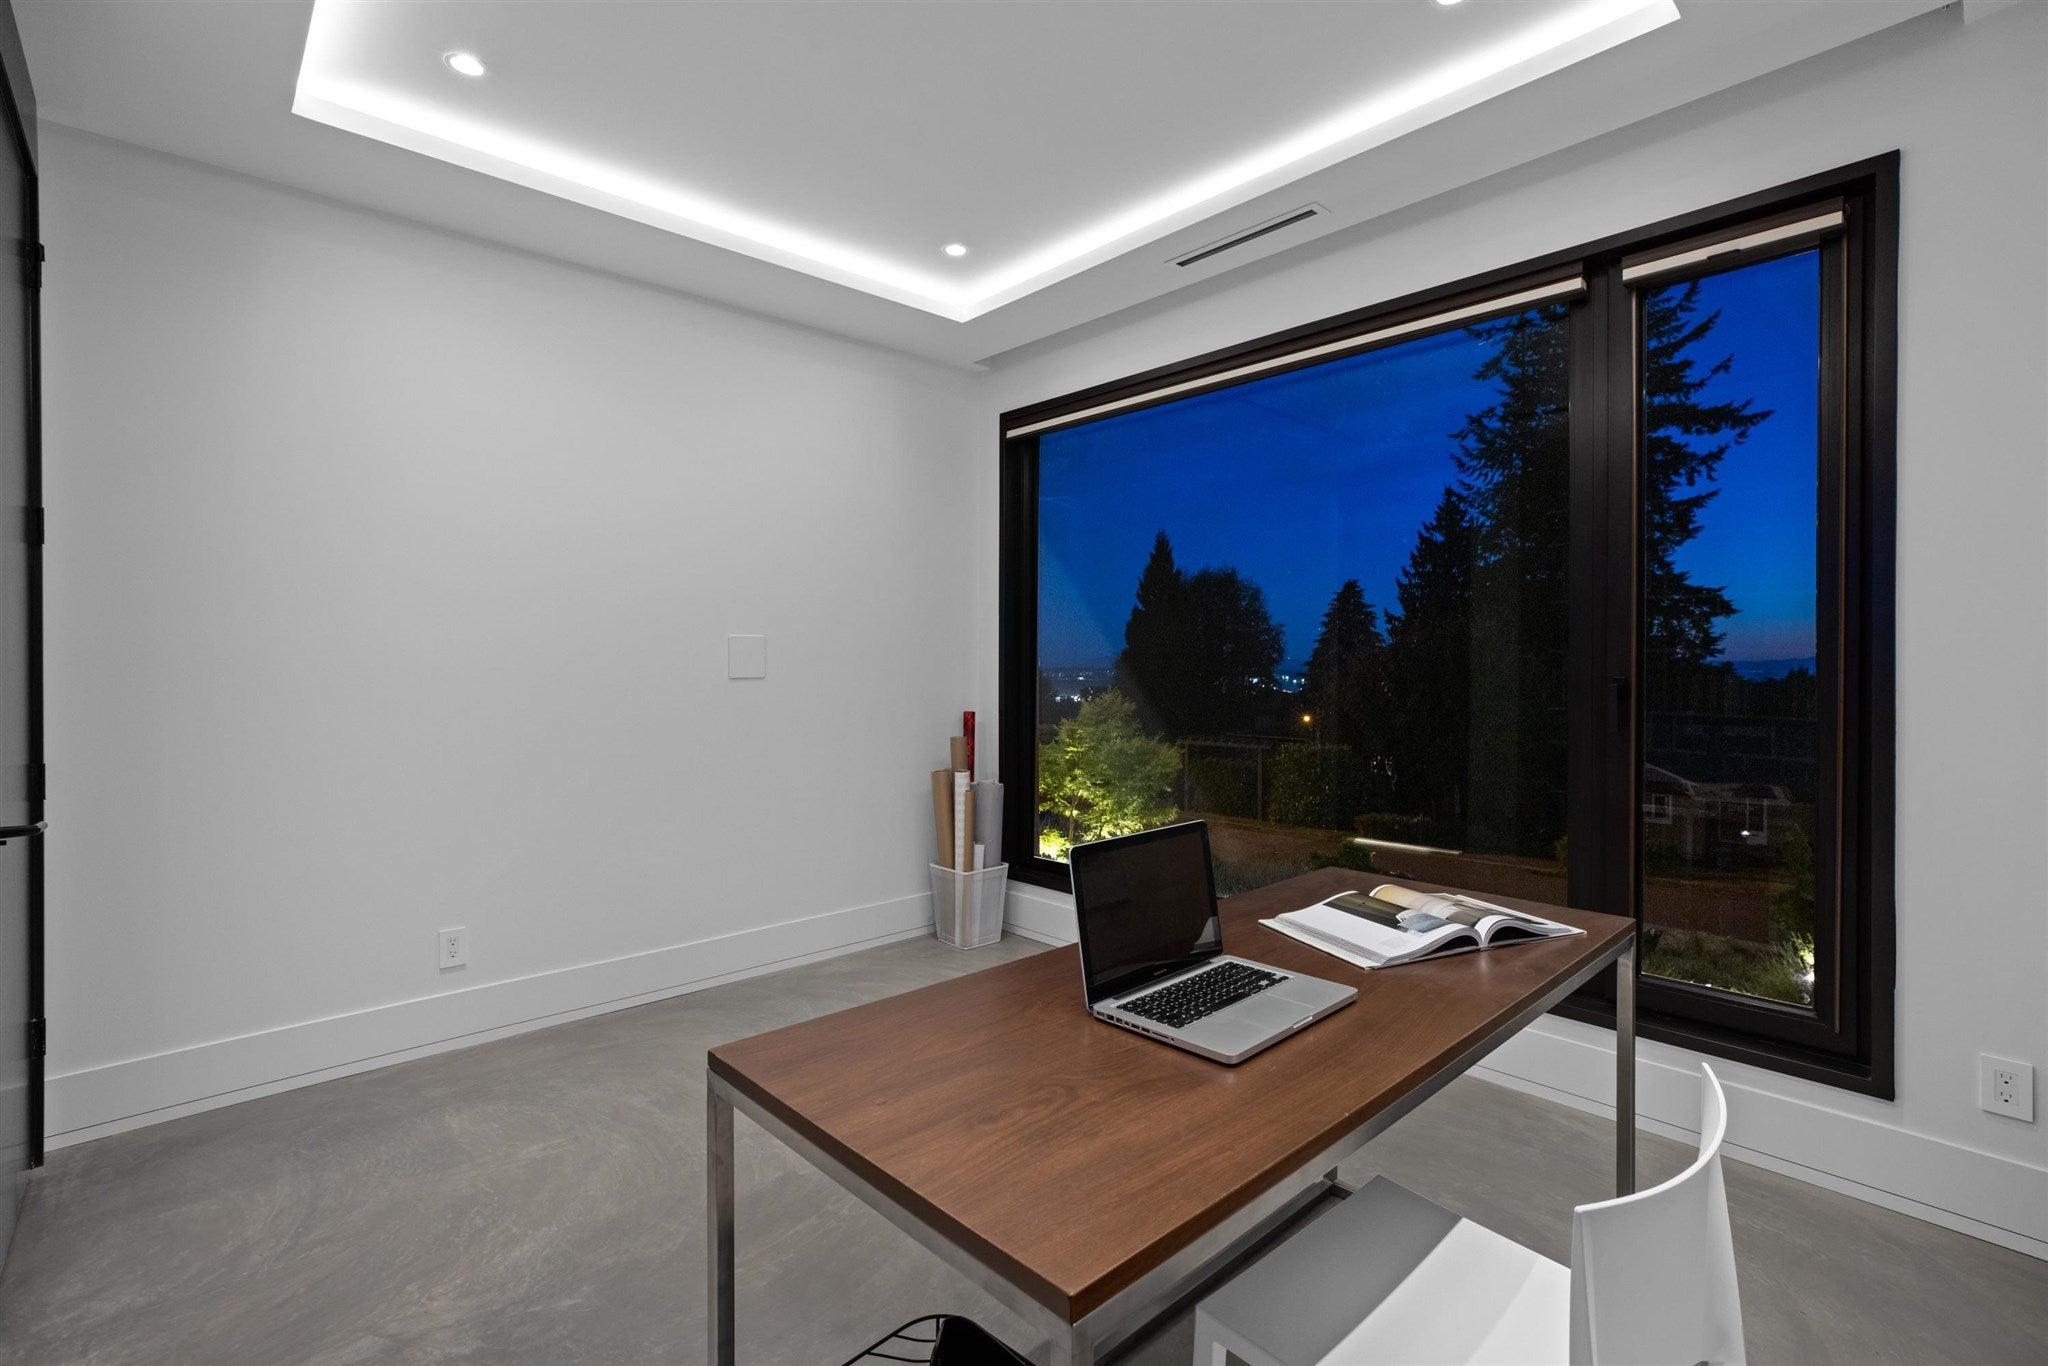 276 SANDRINGHAM CRESCENT - Upper Lonsdale House/Single Family for sale, 7 Bedrooms (R2617703) - #18